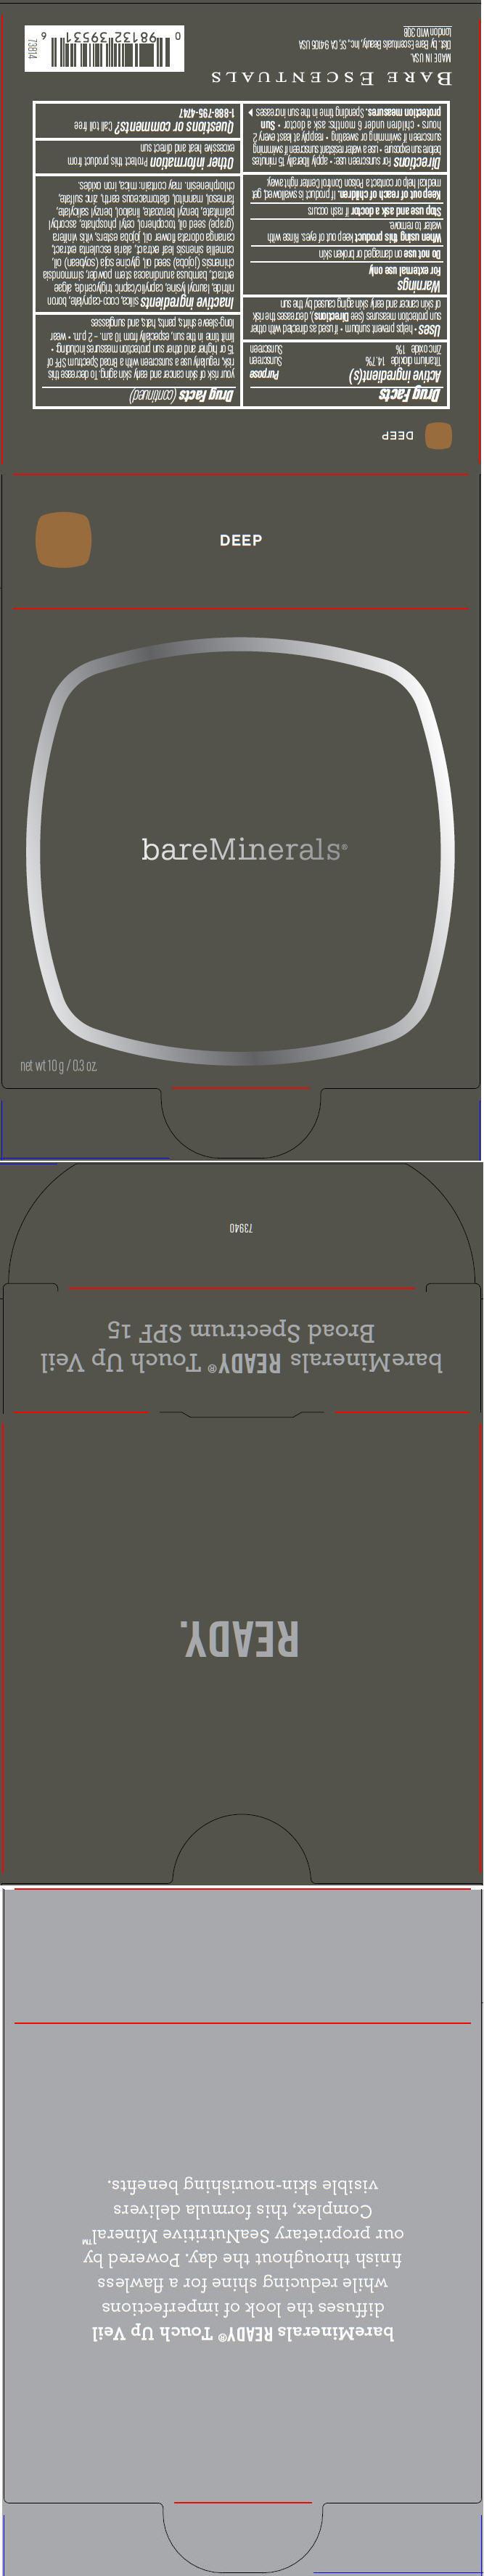 Principal Display Panel - 10 g Tray Carton - Deep